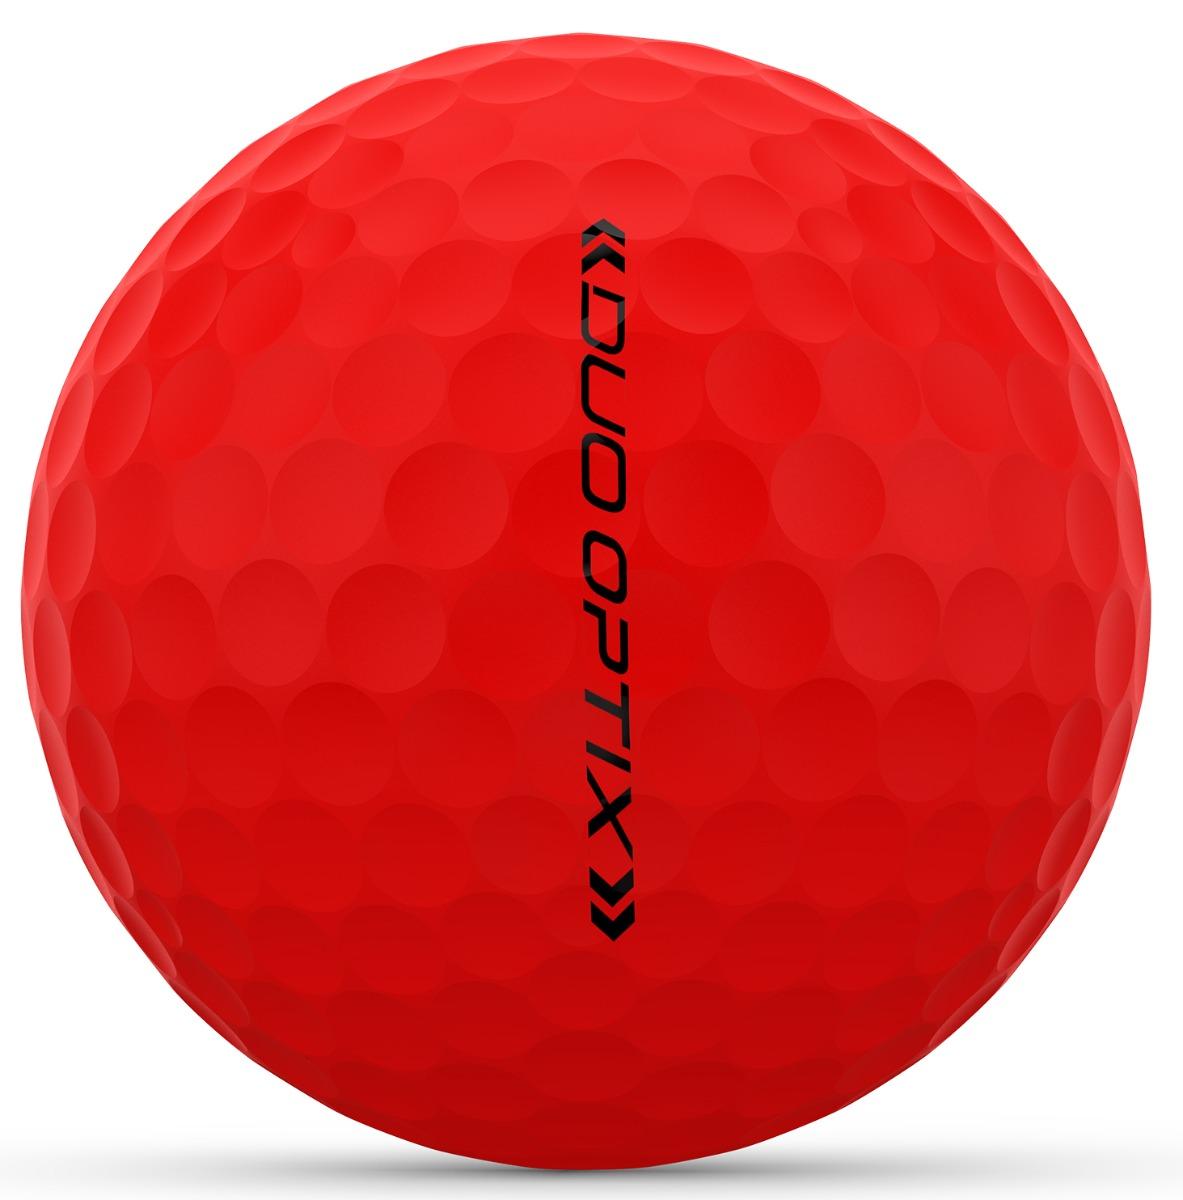 https://www.best4sportsballs.com/pub/media/catalog/product/d/u/duo_optix_red_ball_ball.jpg